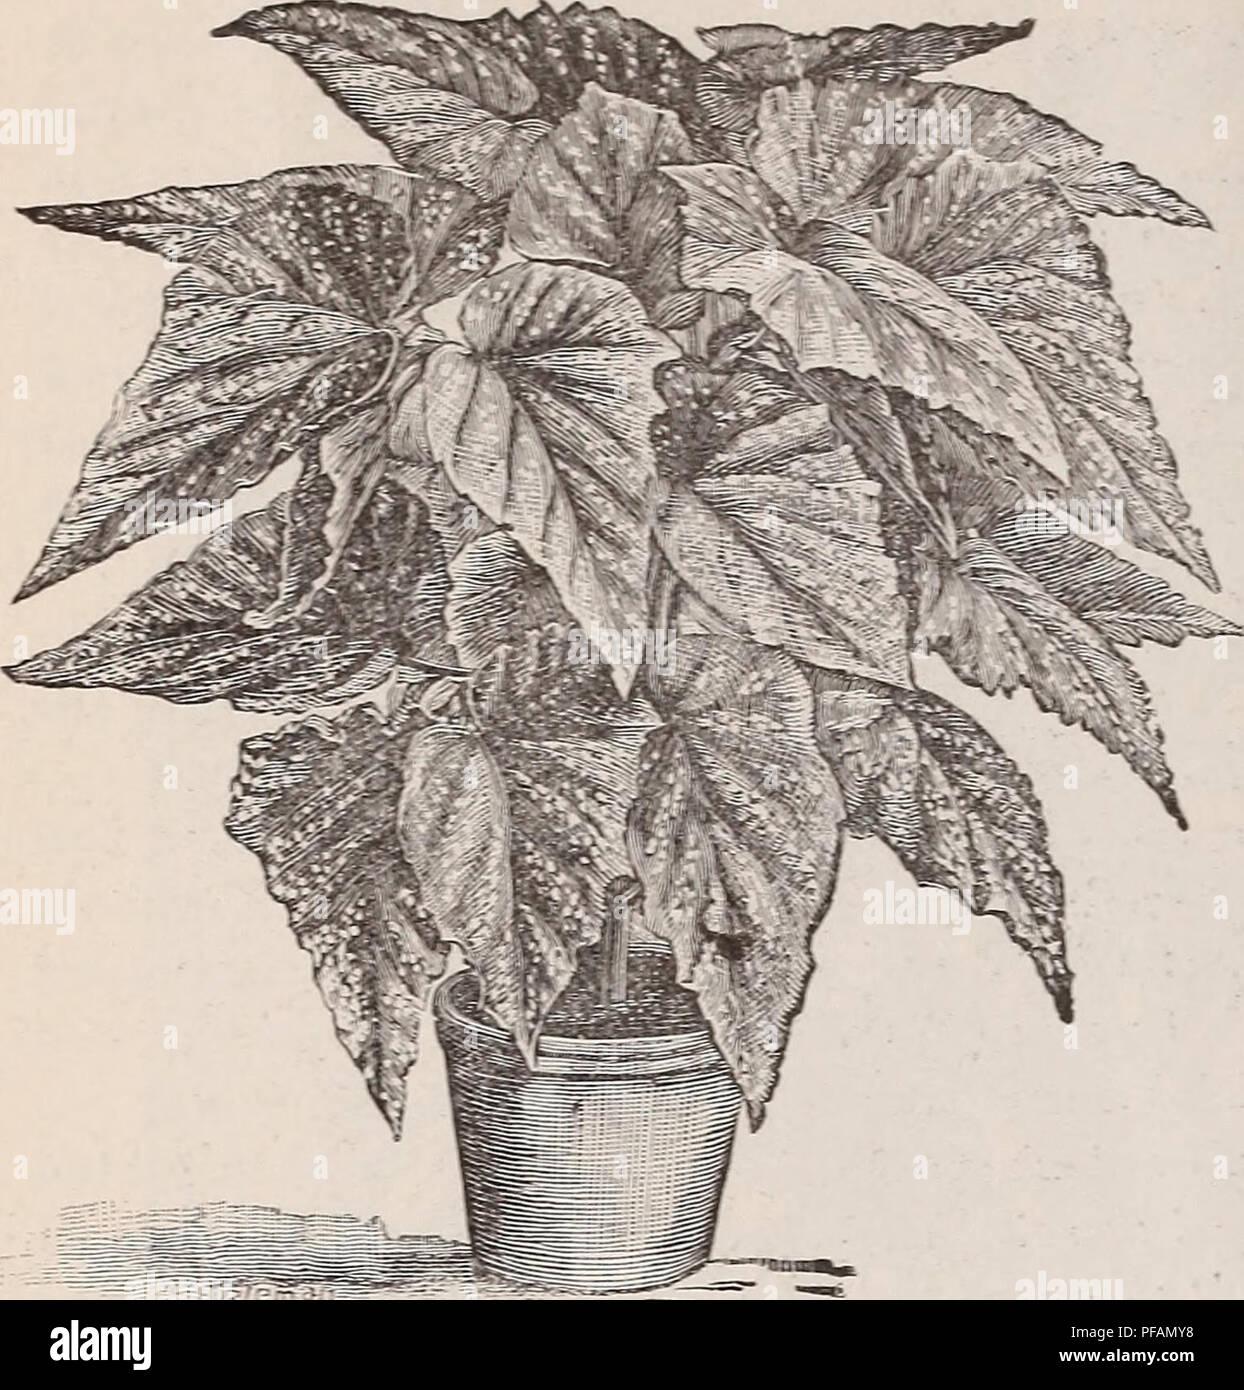 Descriptive List Of Plants Nursery Stock New Hampshire Keene